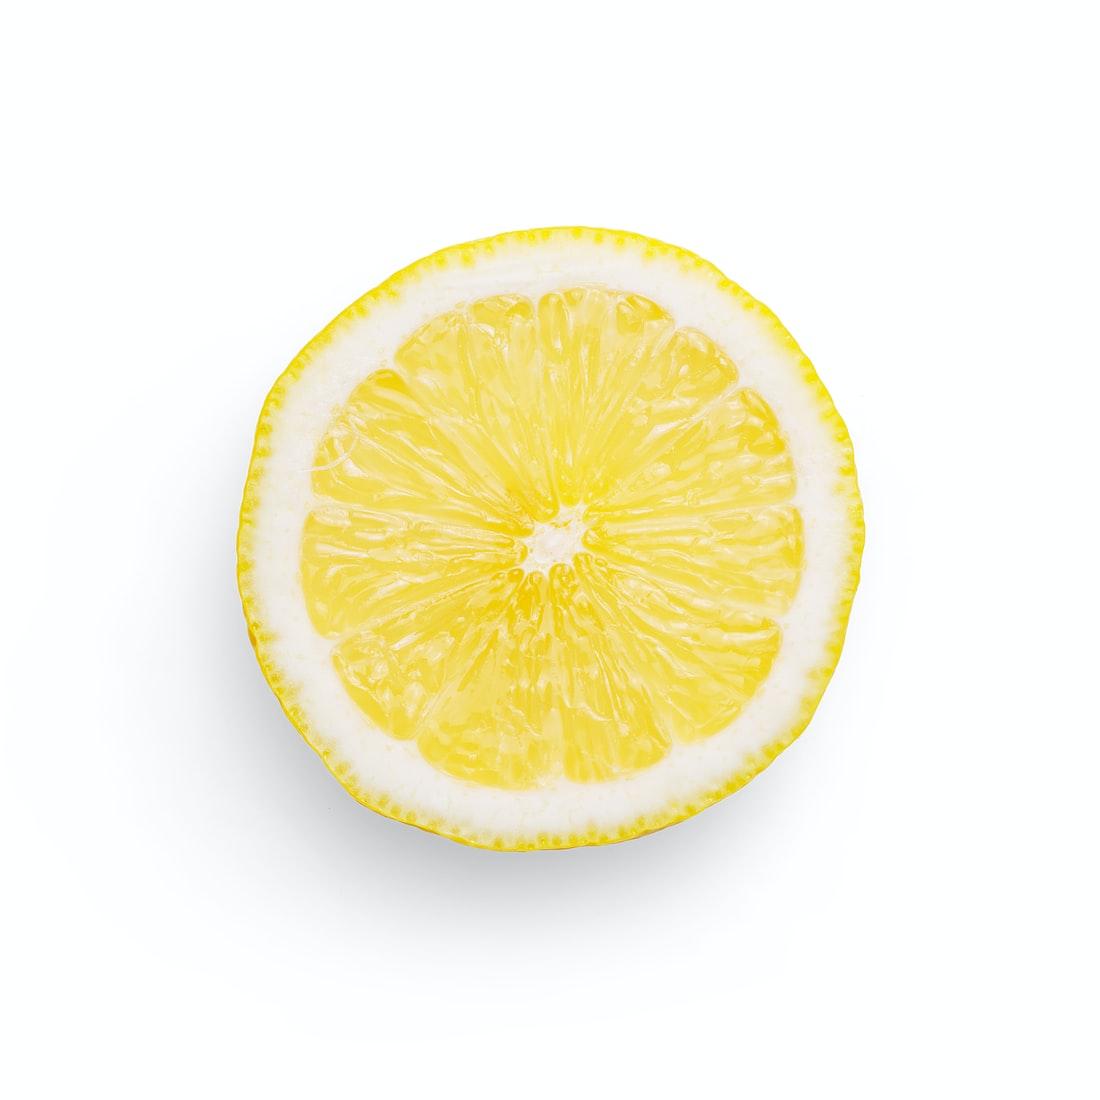 citroen-plakje